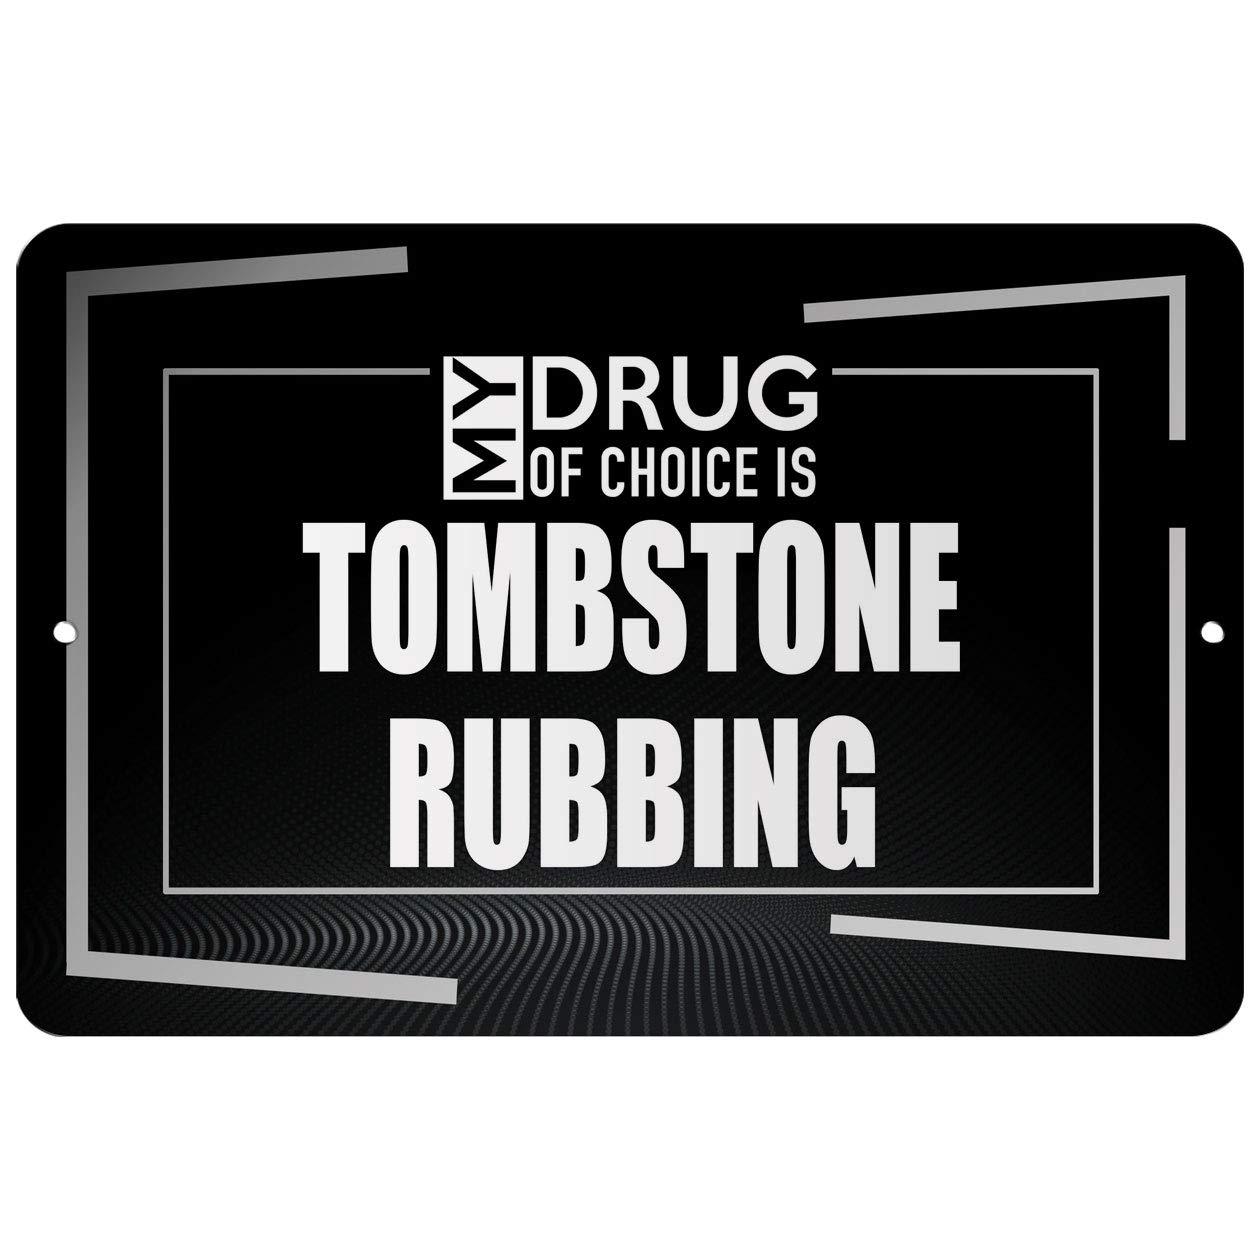 Makoroni - My Drug of Choice is Tombstone RUBBING Hobby - Street Sign 12''x18'' Aluminum by Makoroni